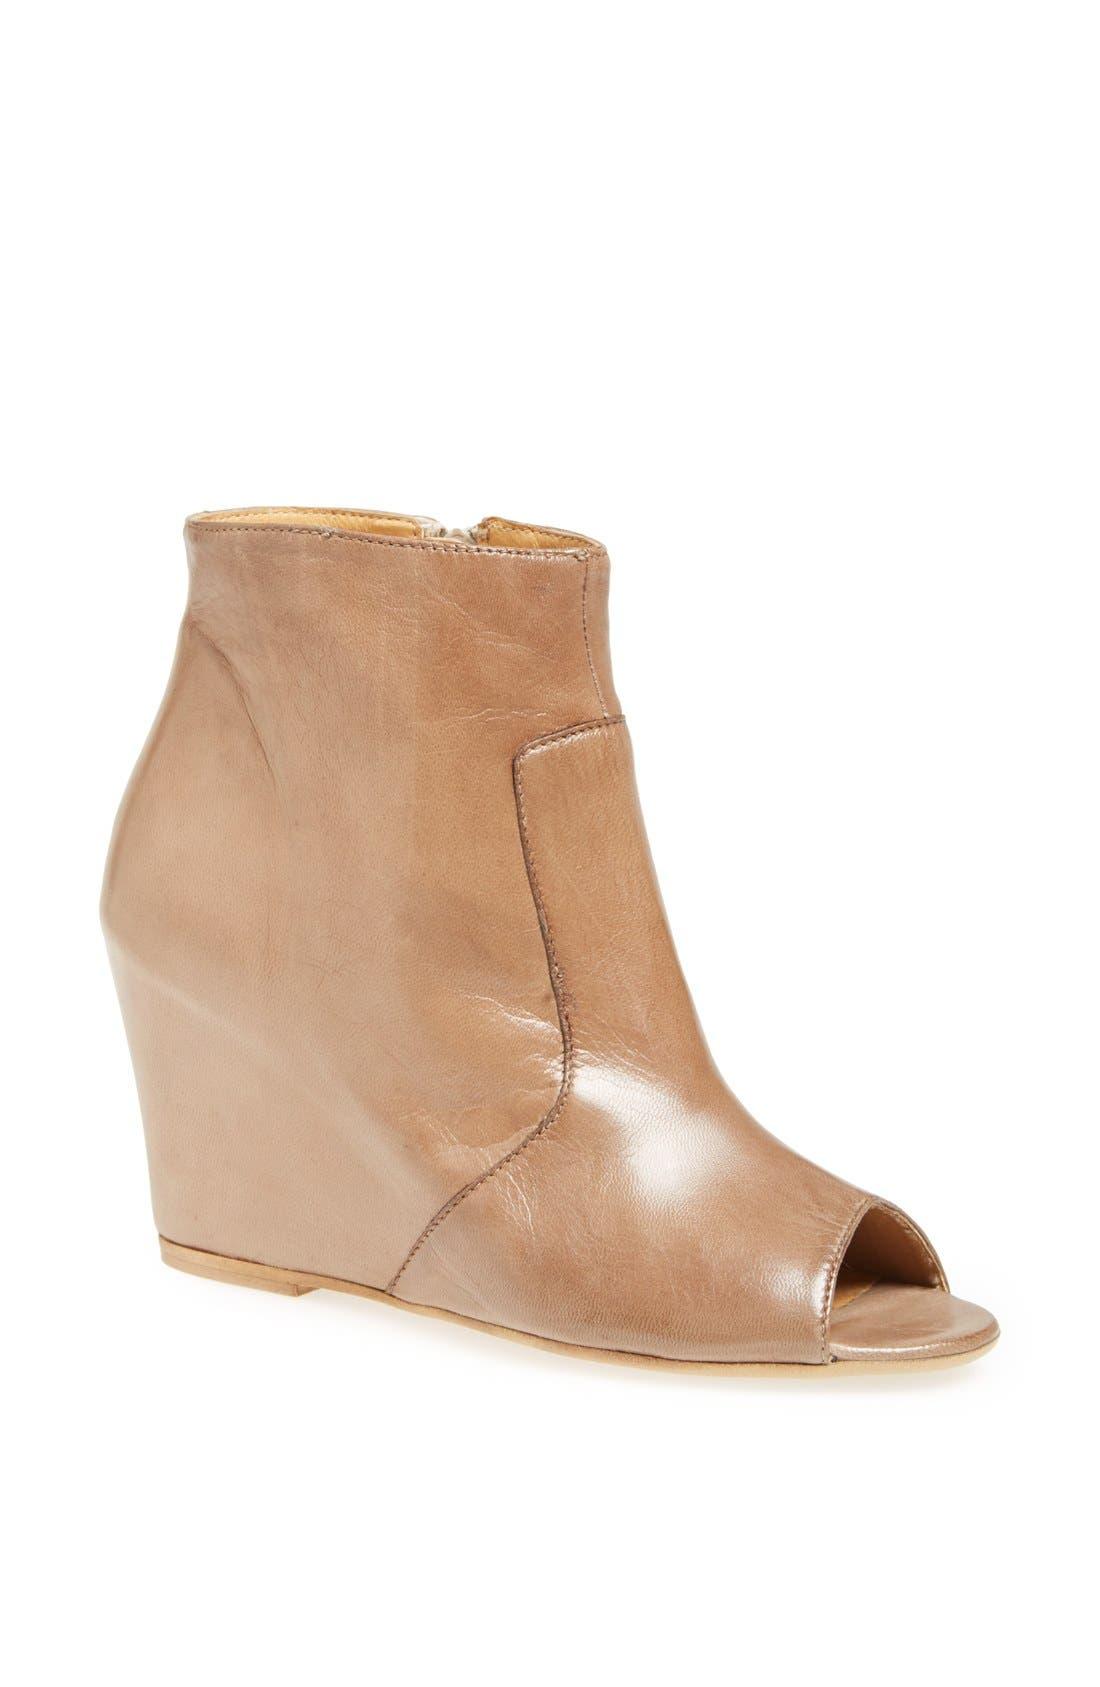 Alternate Image 1 Selected - Paola Ferri Open Toe Ankle Boot